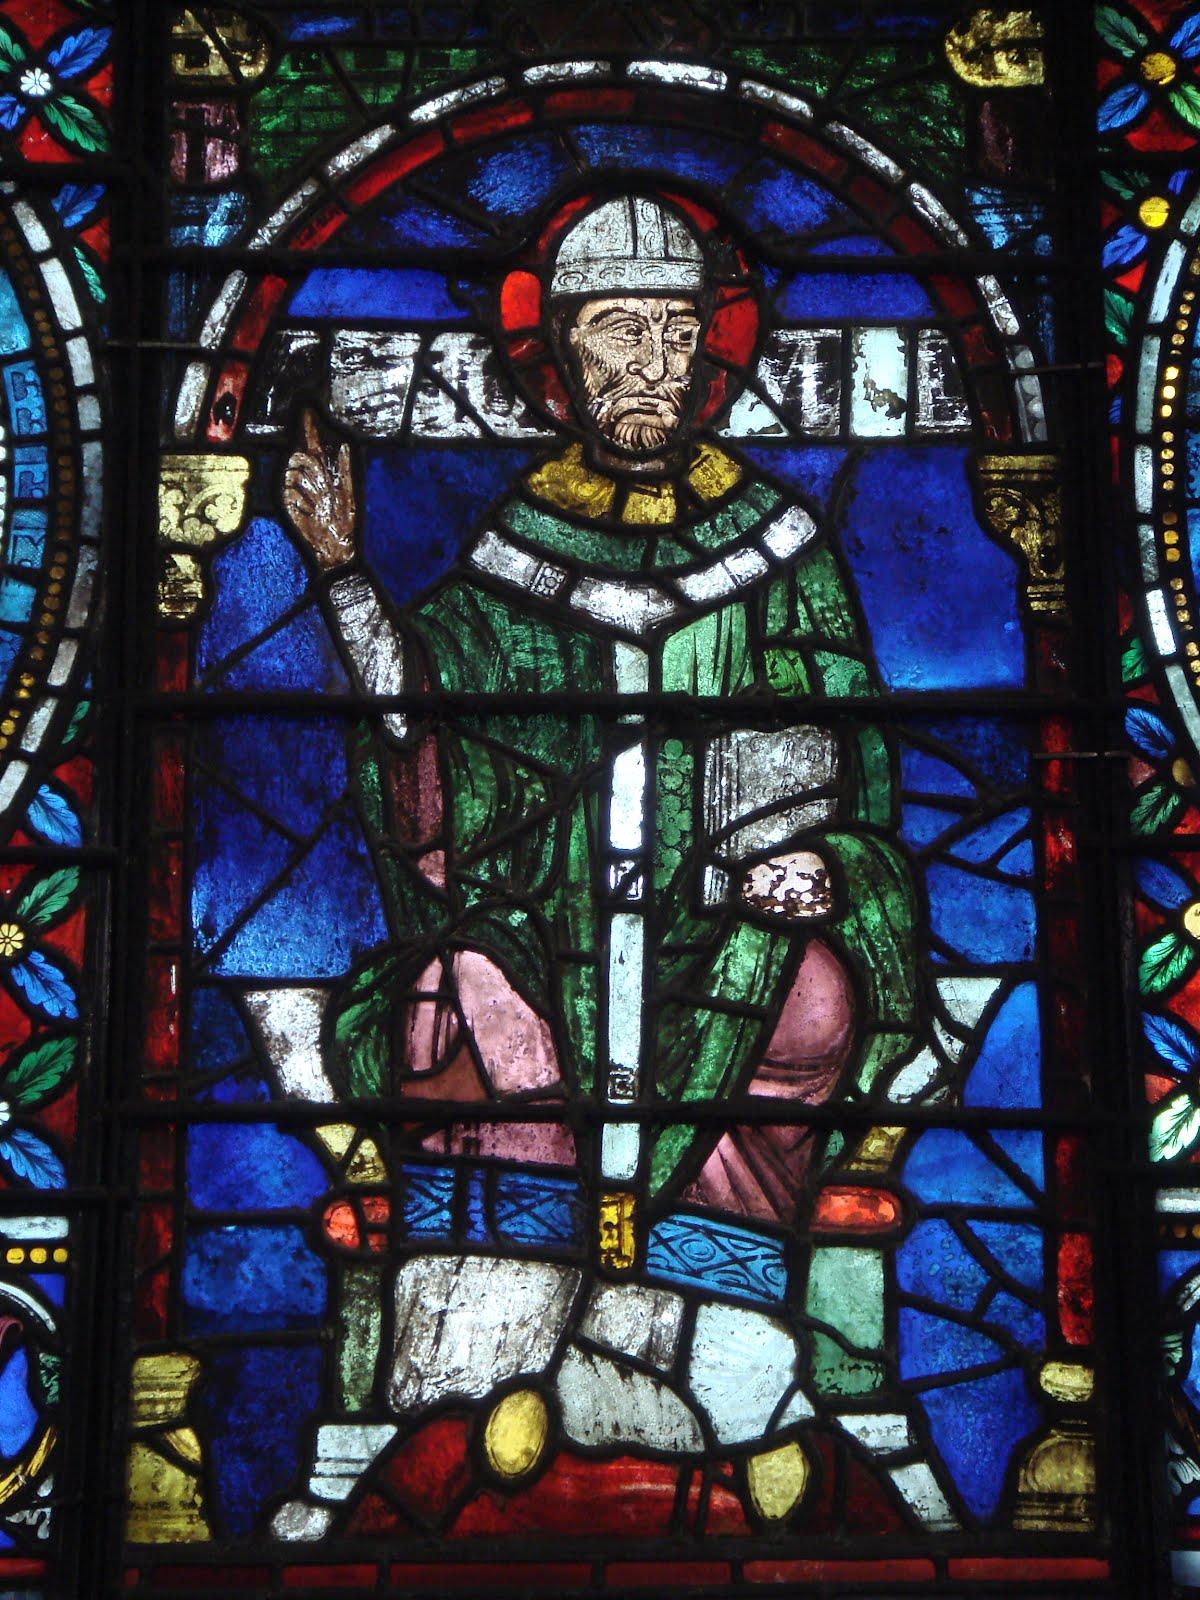 Archbishop of Canterbury -Thomas Becket